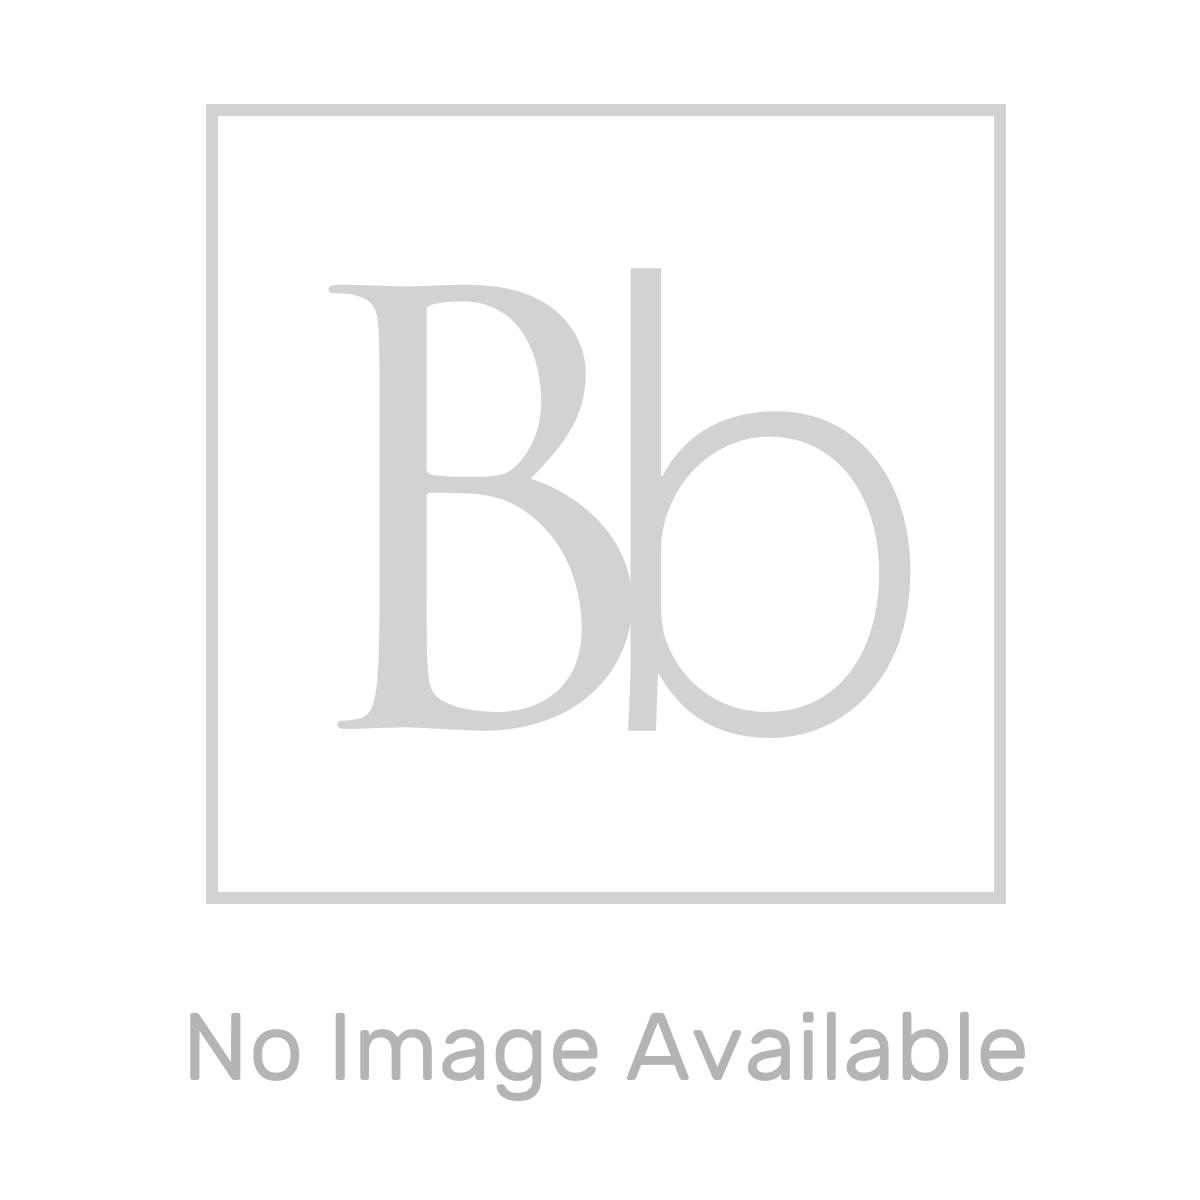 Frontline Alex Designer Heated Towel Rail 1140 x 500mm Dimensions